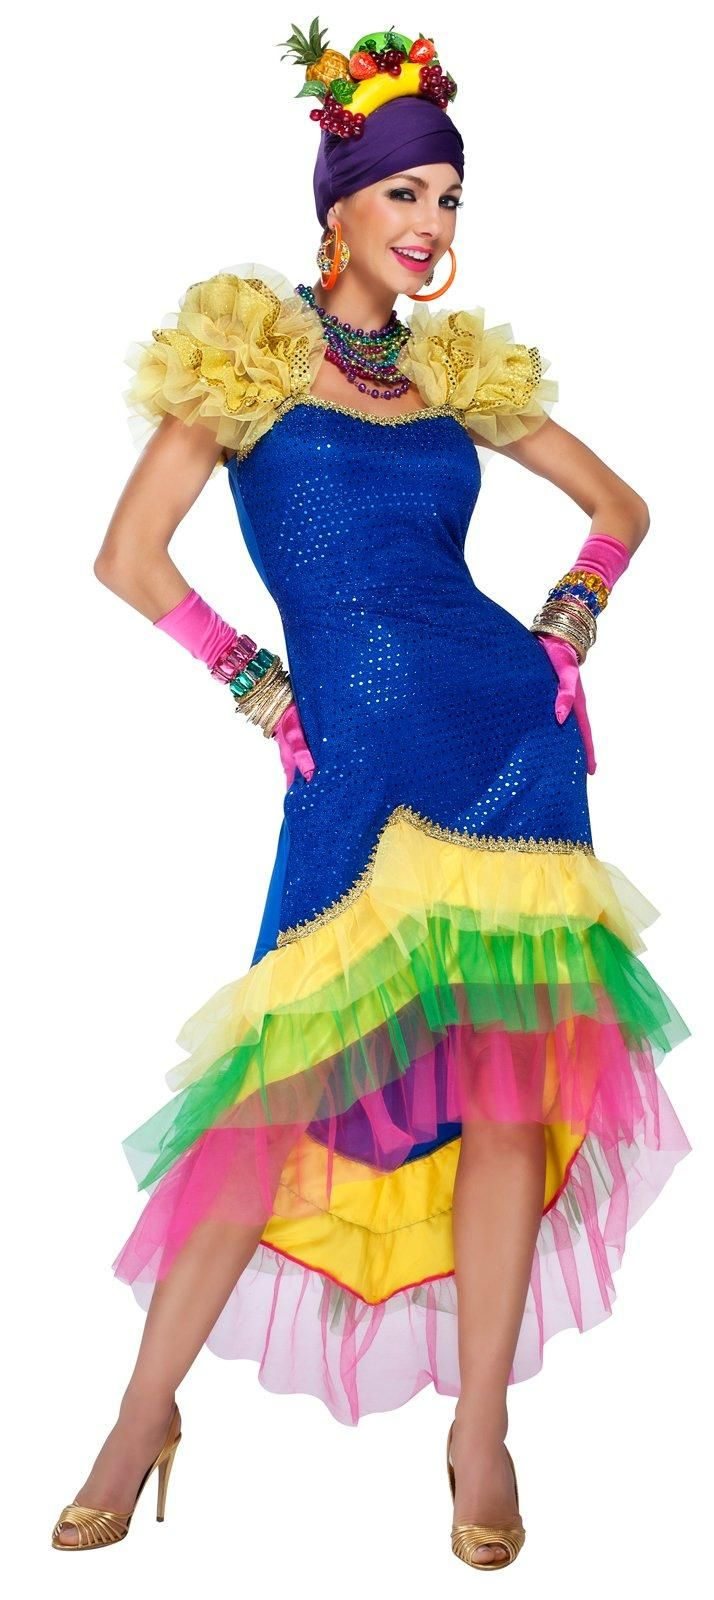 Carmen Miranda Adult Dance Costume from Buycostumes.com